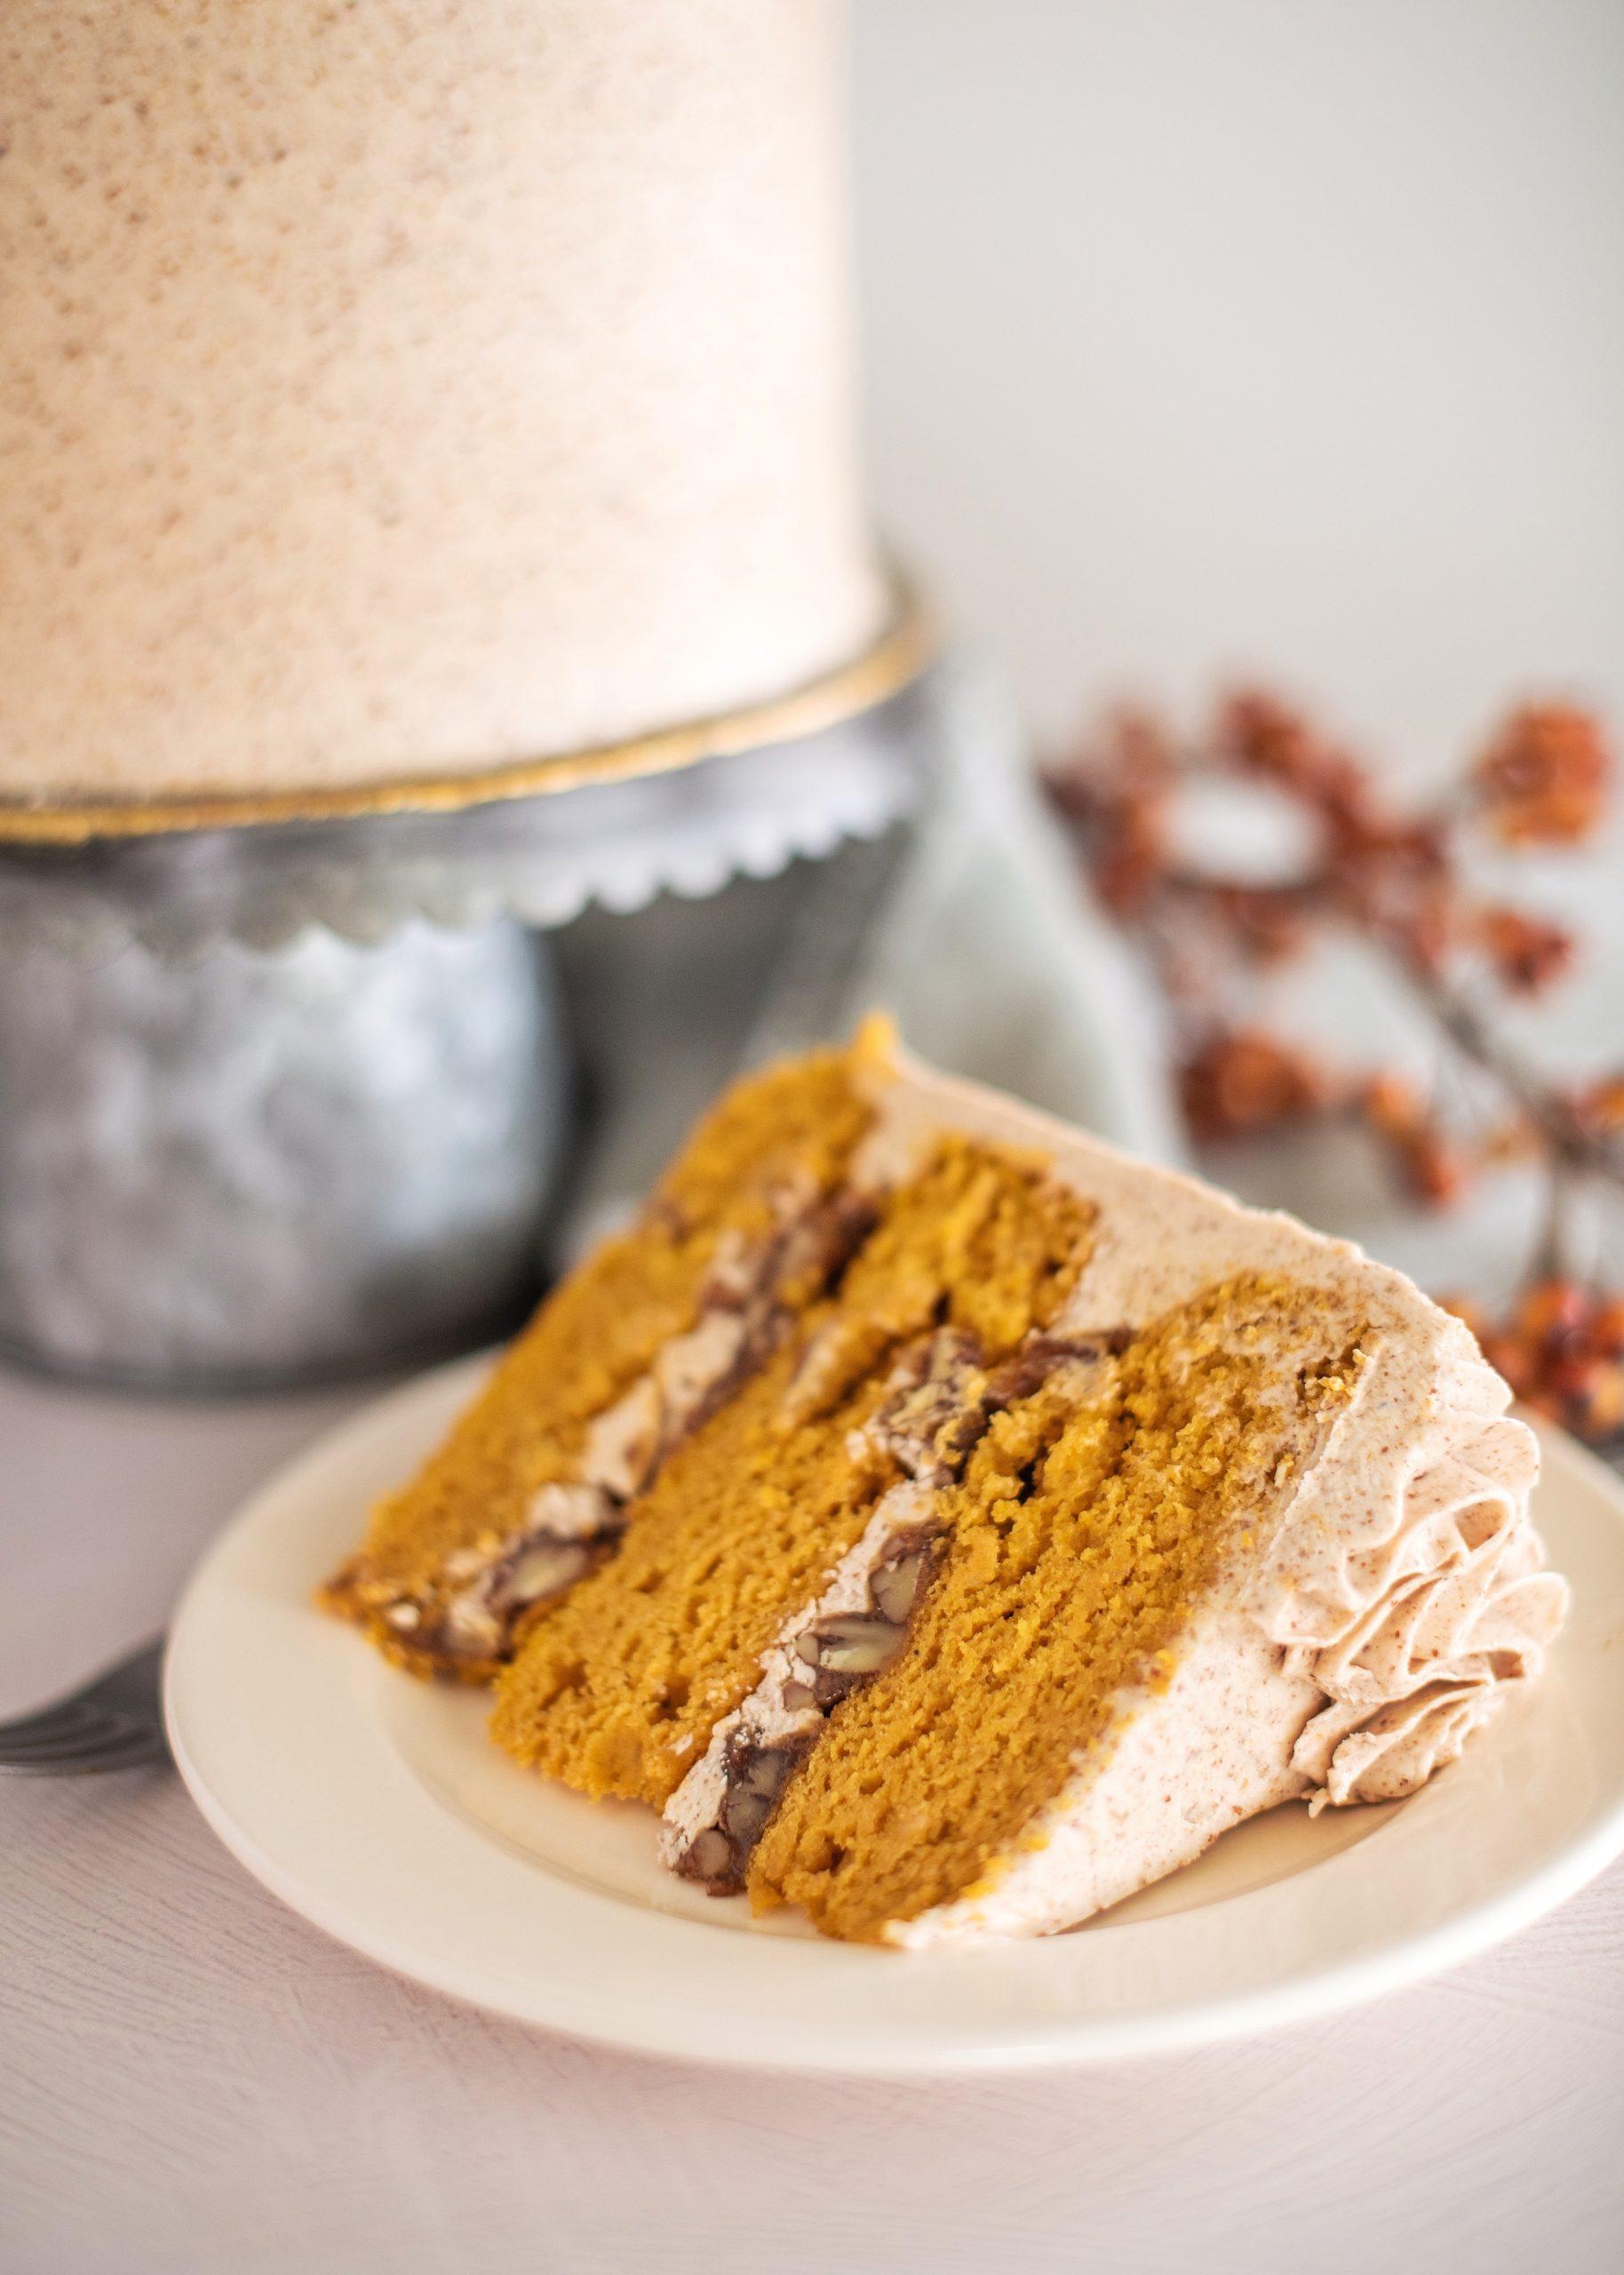 Inside layers of the Pumpkin Butter Pecan Cake